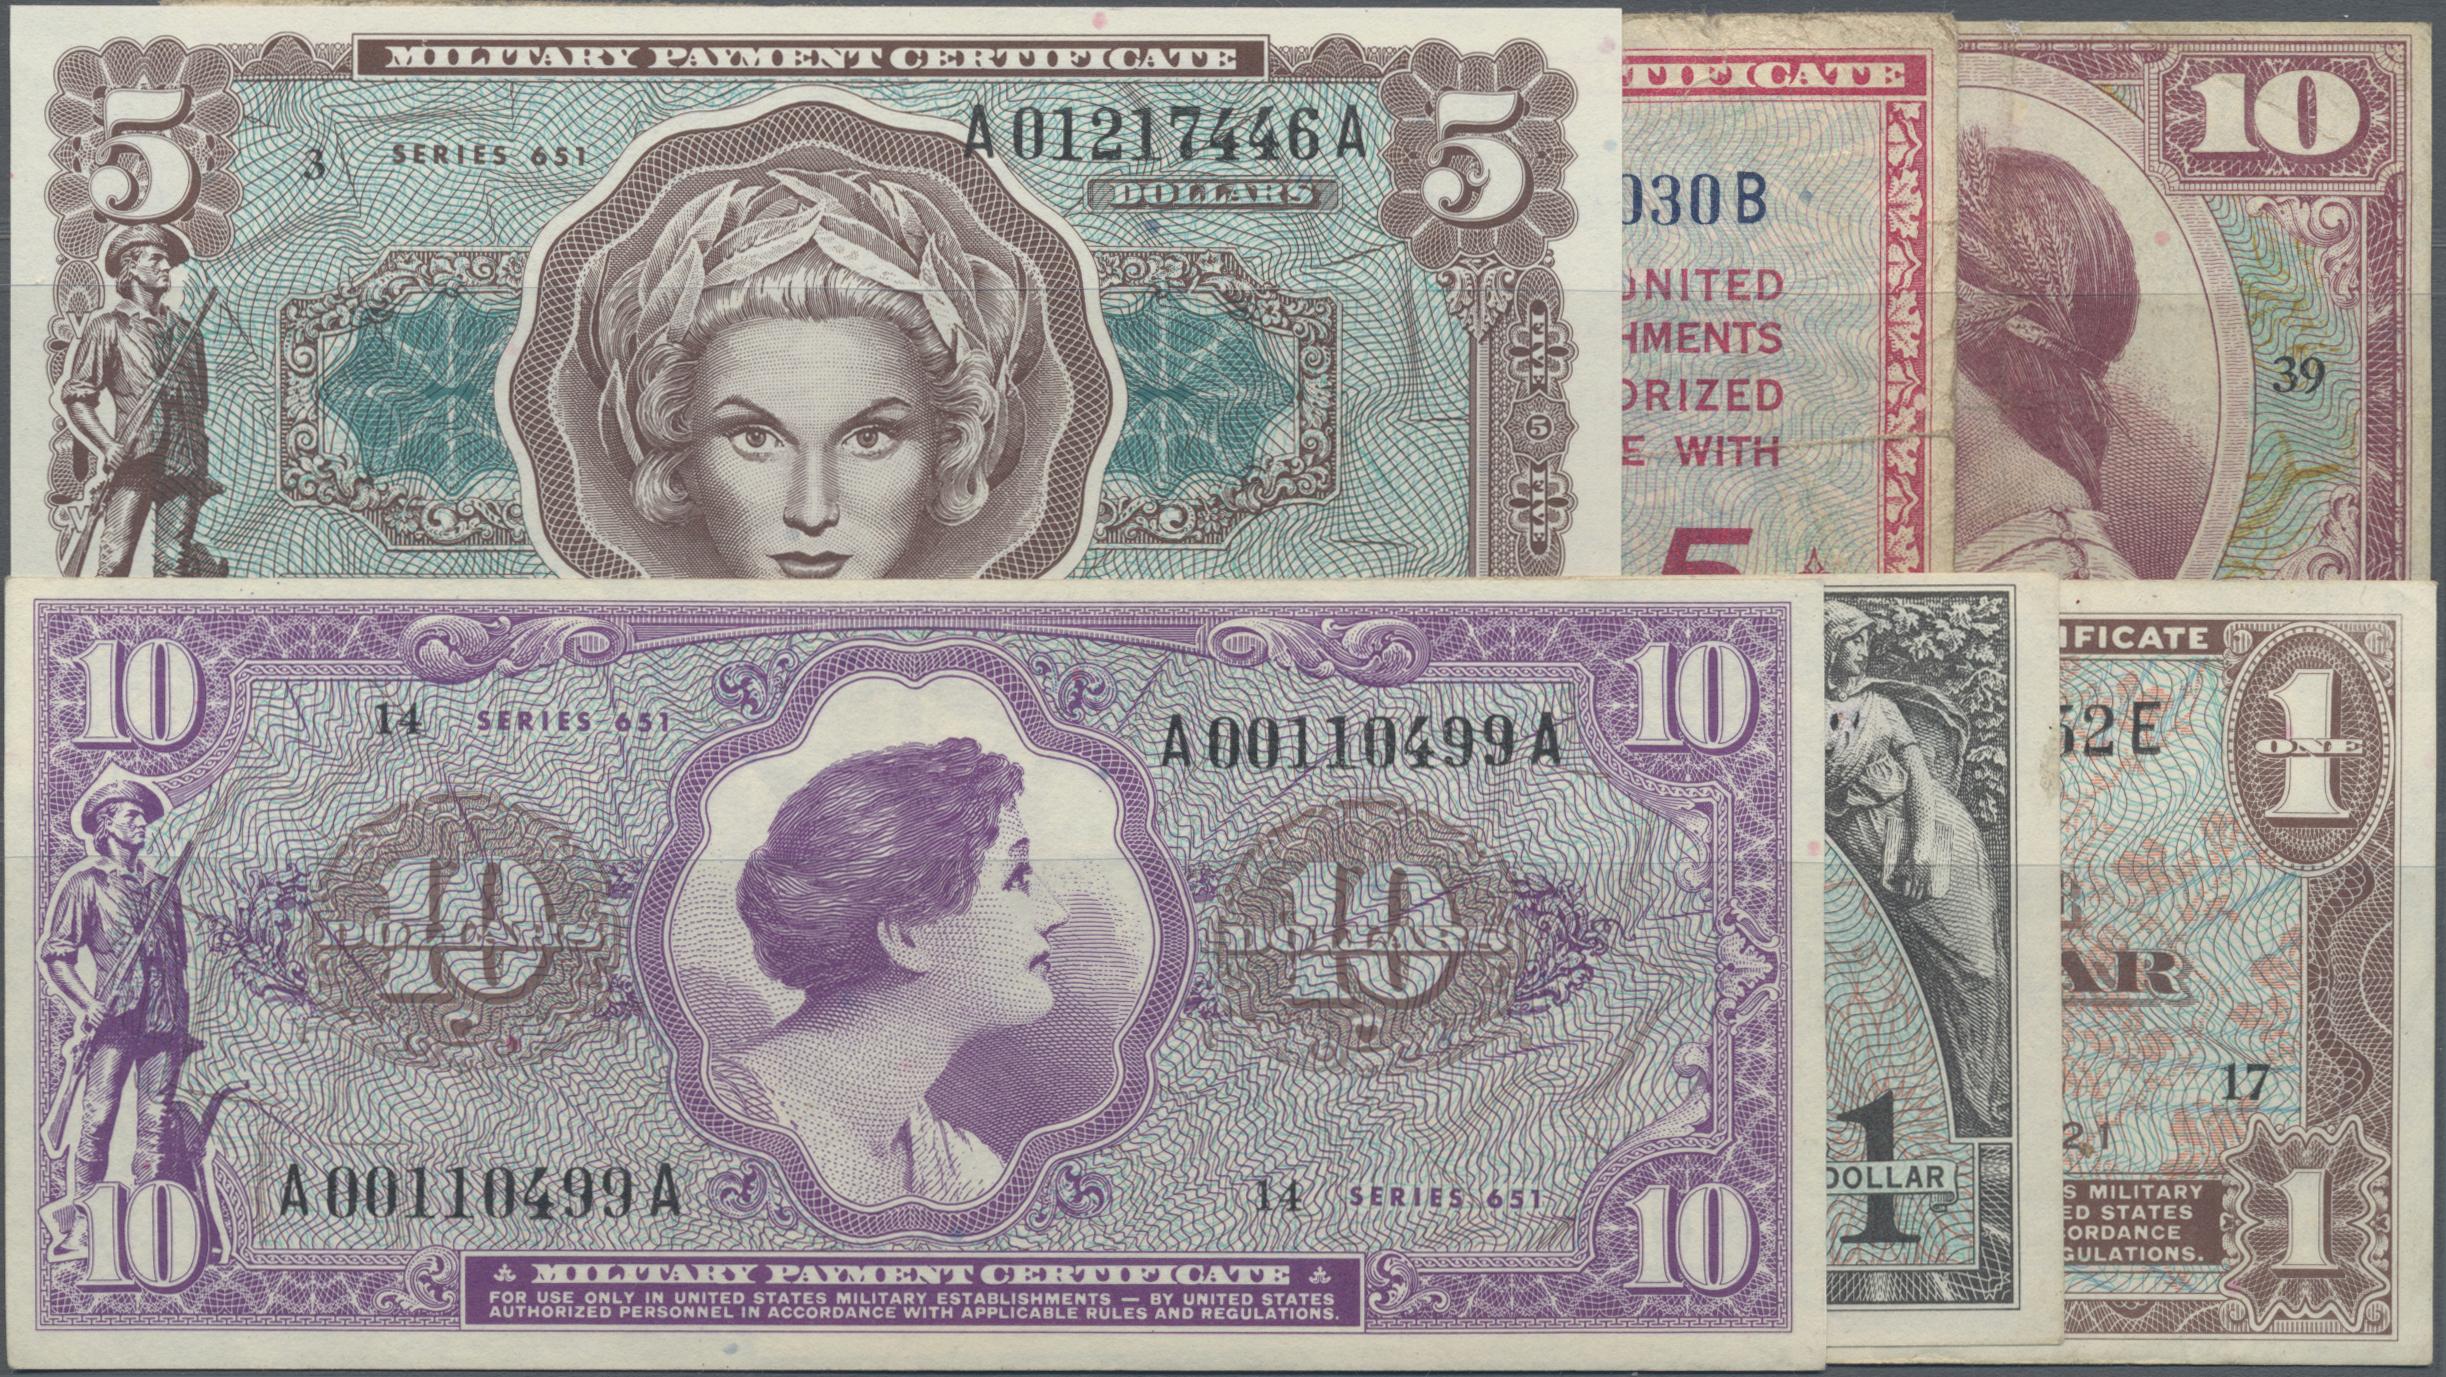 Lot 02833 - United States of America | Banknoten  -  Auktionshaus Christoph Gärtner GmbH & Co. KG Sale #45 Banknotes Worldwide